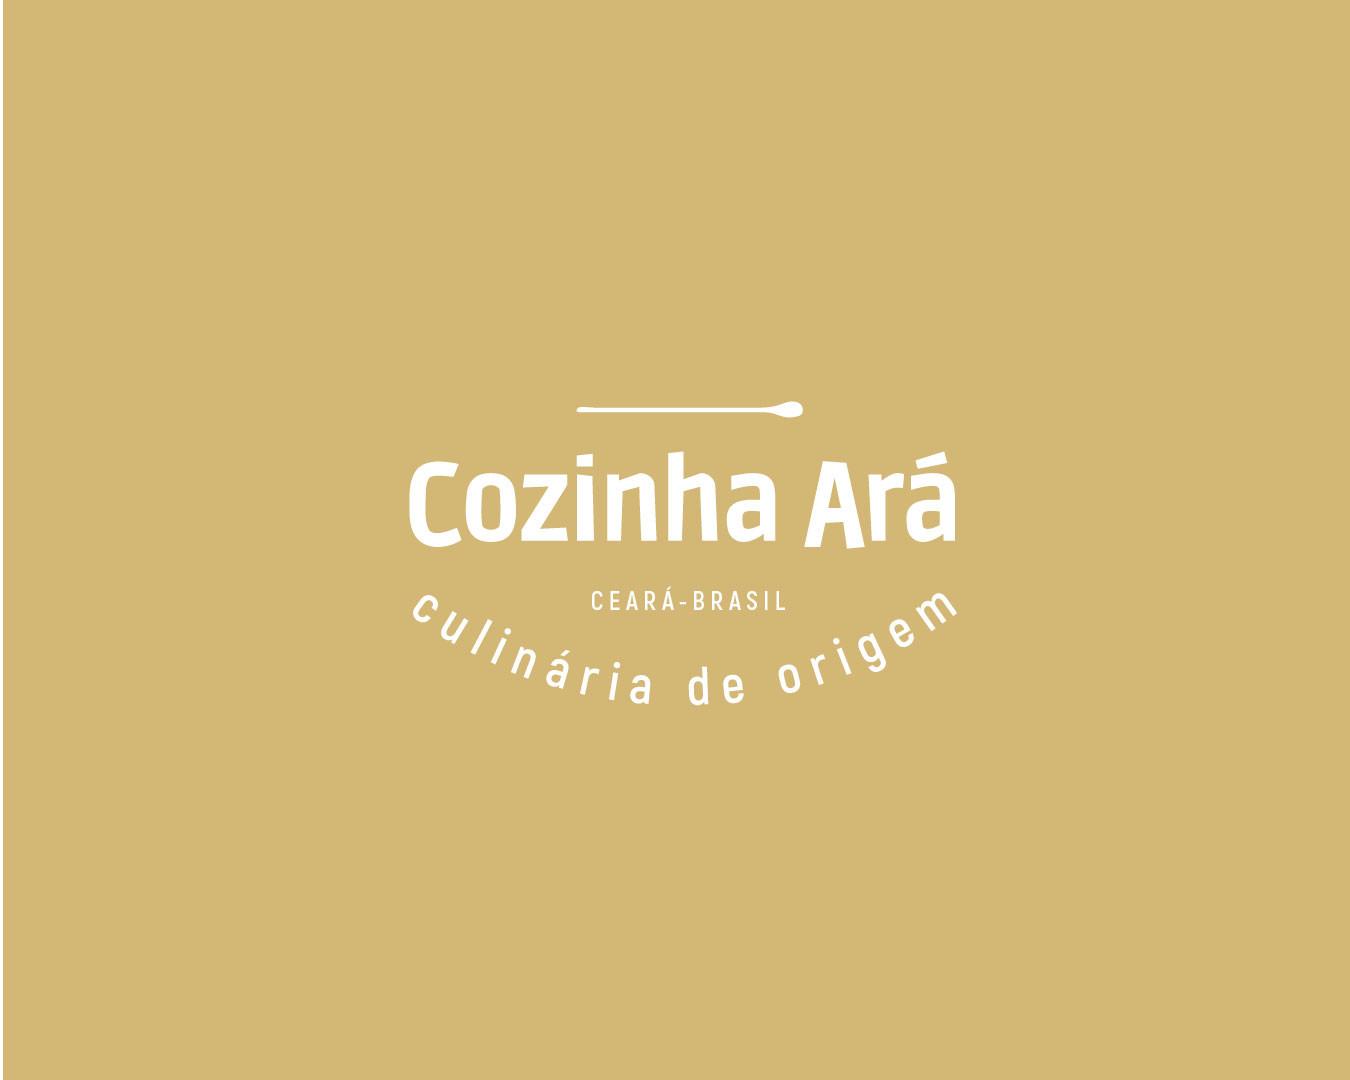 Cozinha_Ará_-_Marca_Marca_2_Cor_+_BG_2.